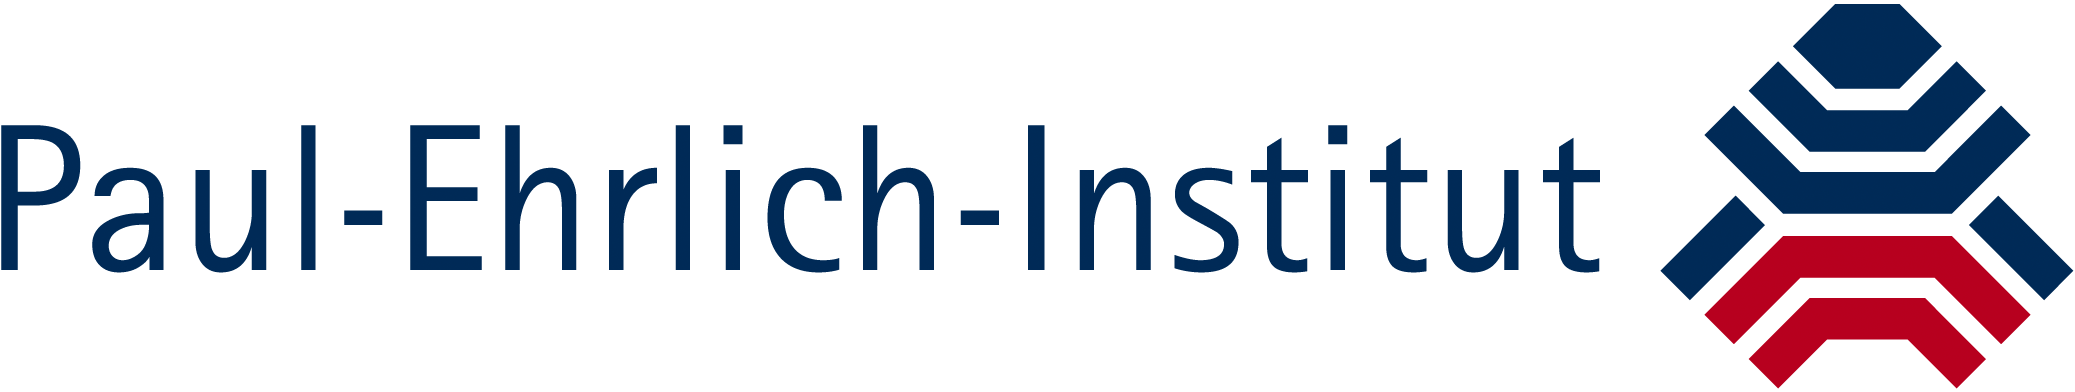 Paul-Ehrlich-Insitut Logo